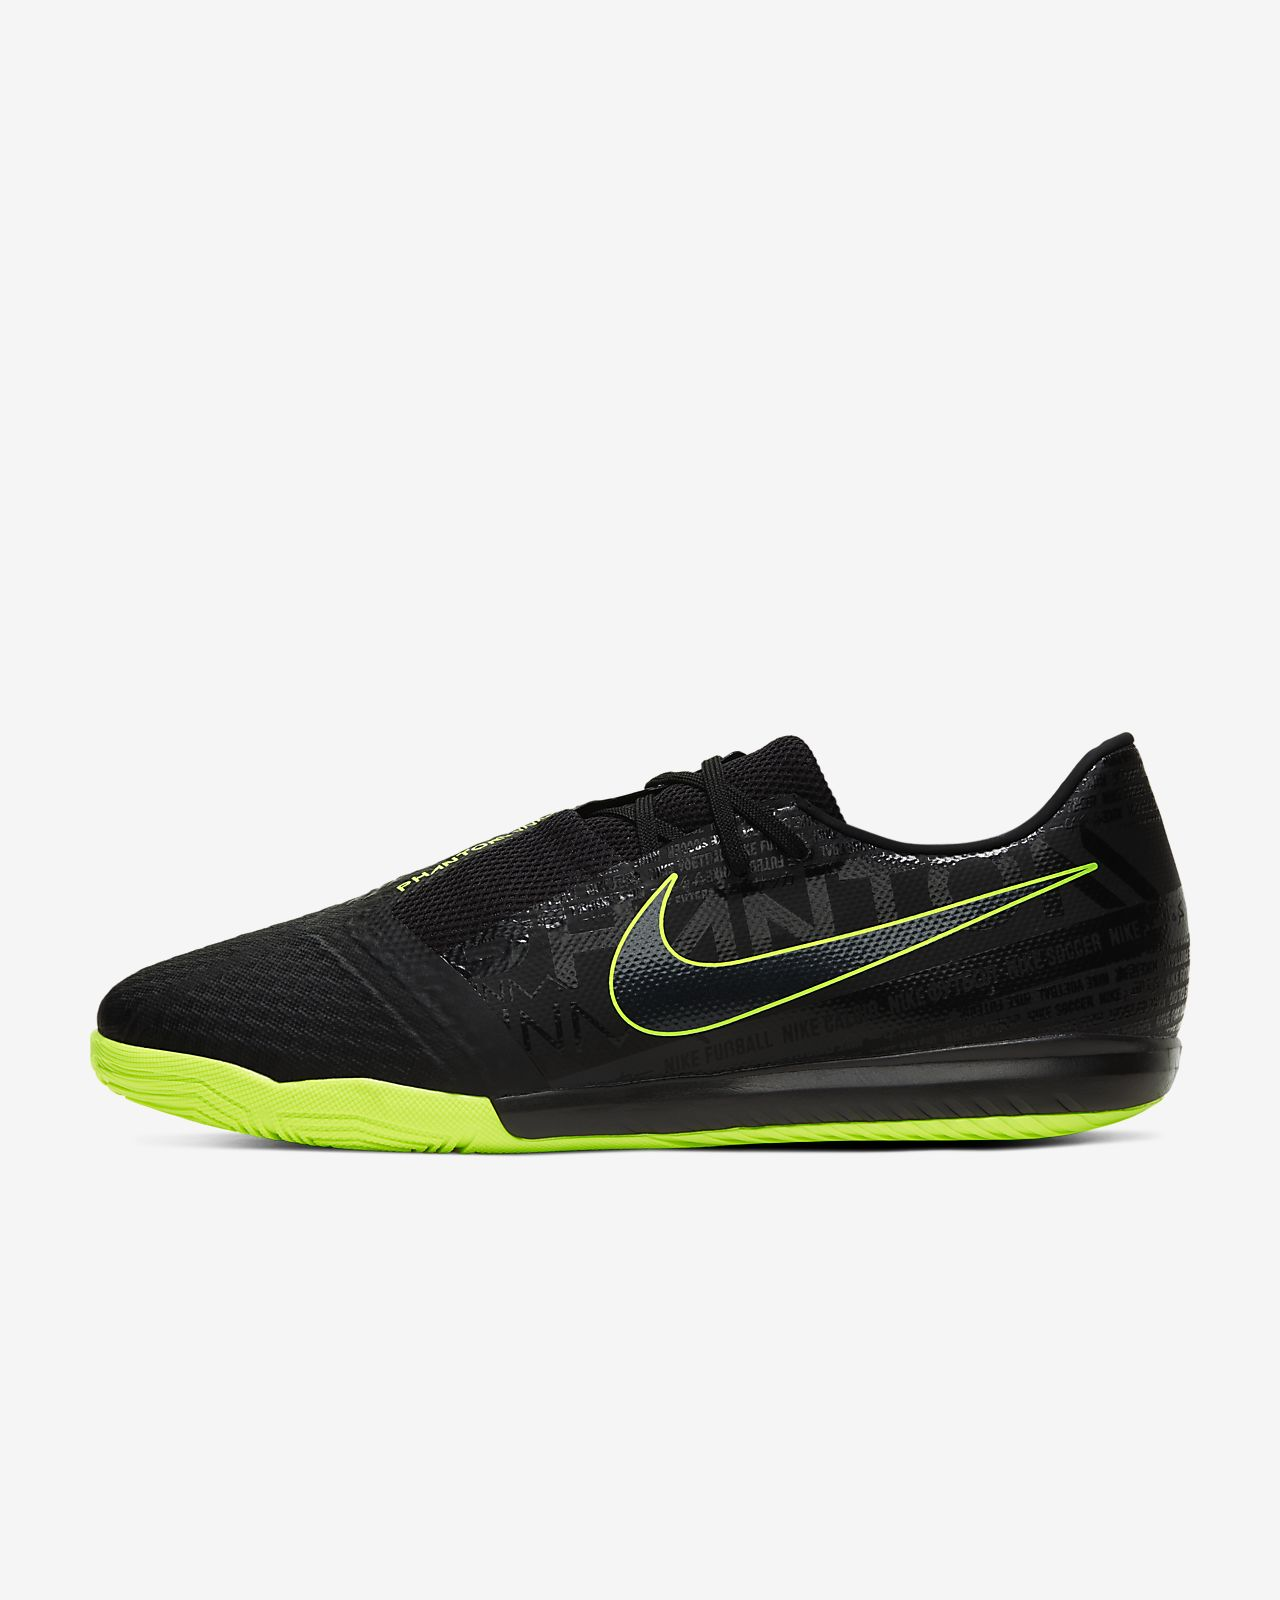 Nike Phantom Venom Academy IC Indoor/Court Football Boot